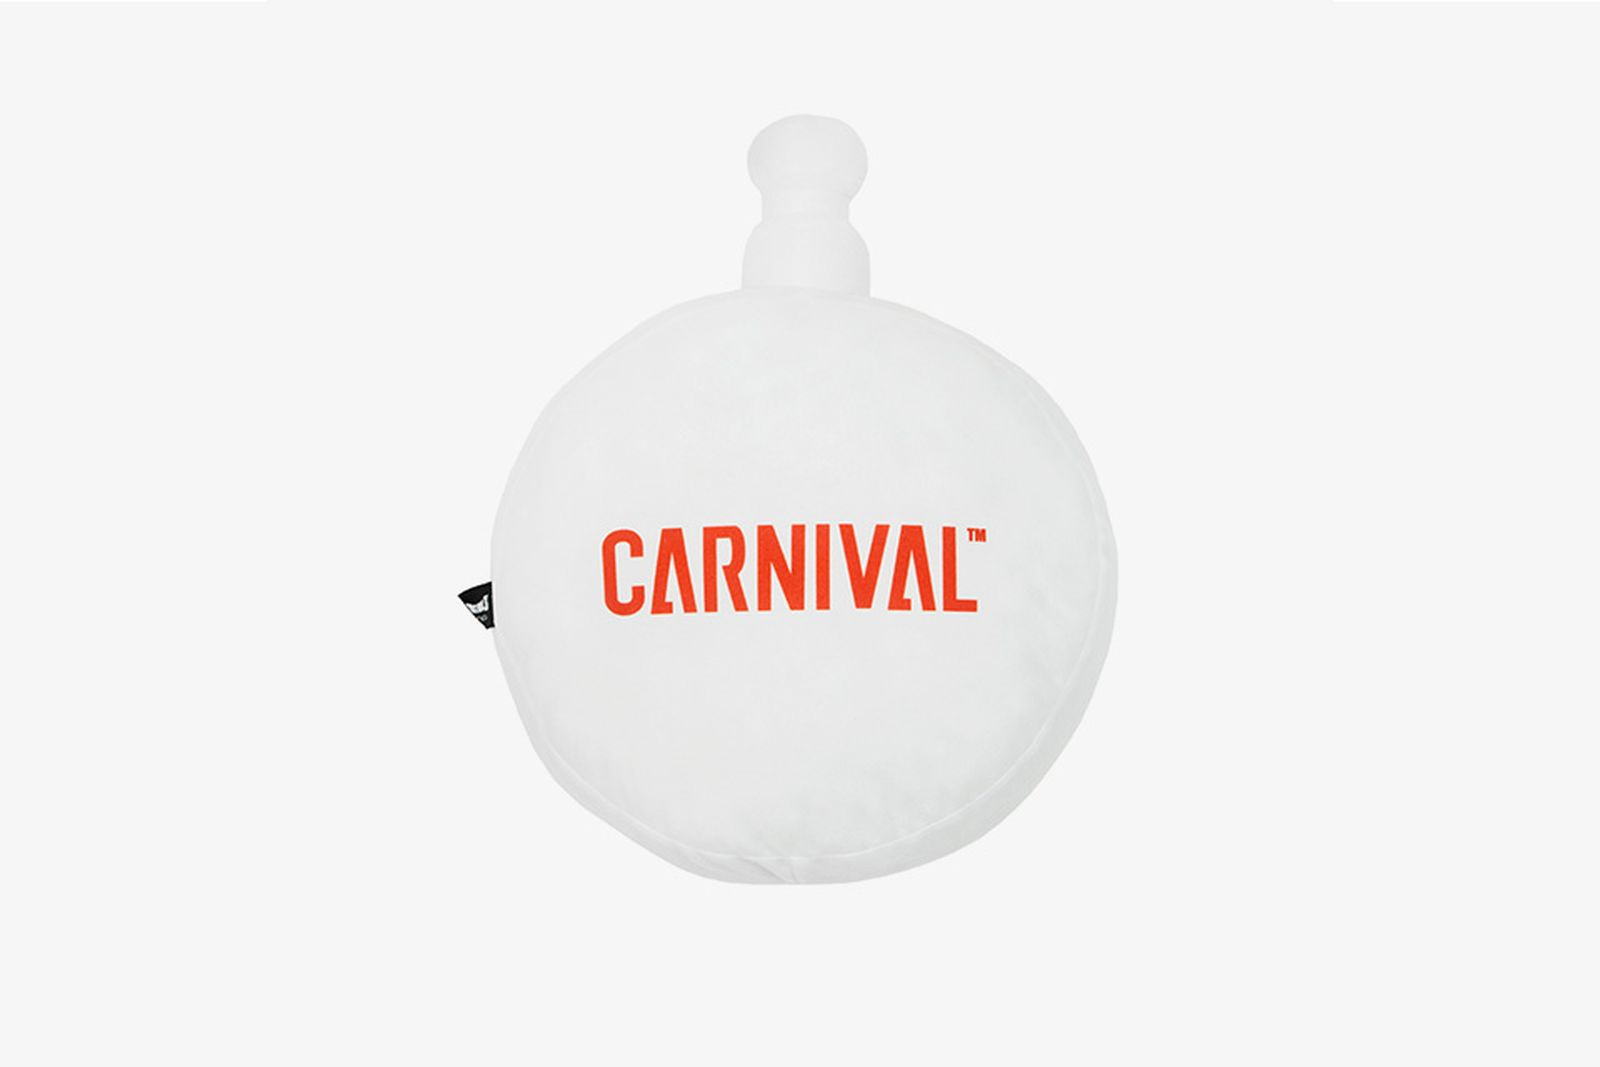 carnival-dragon-ball-z-06